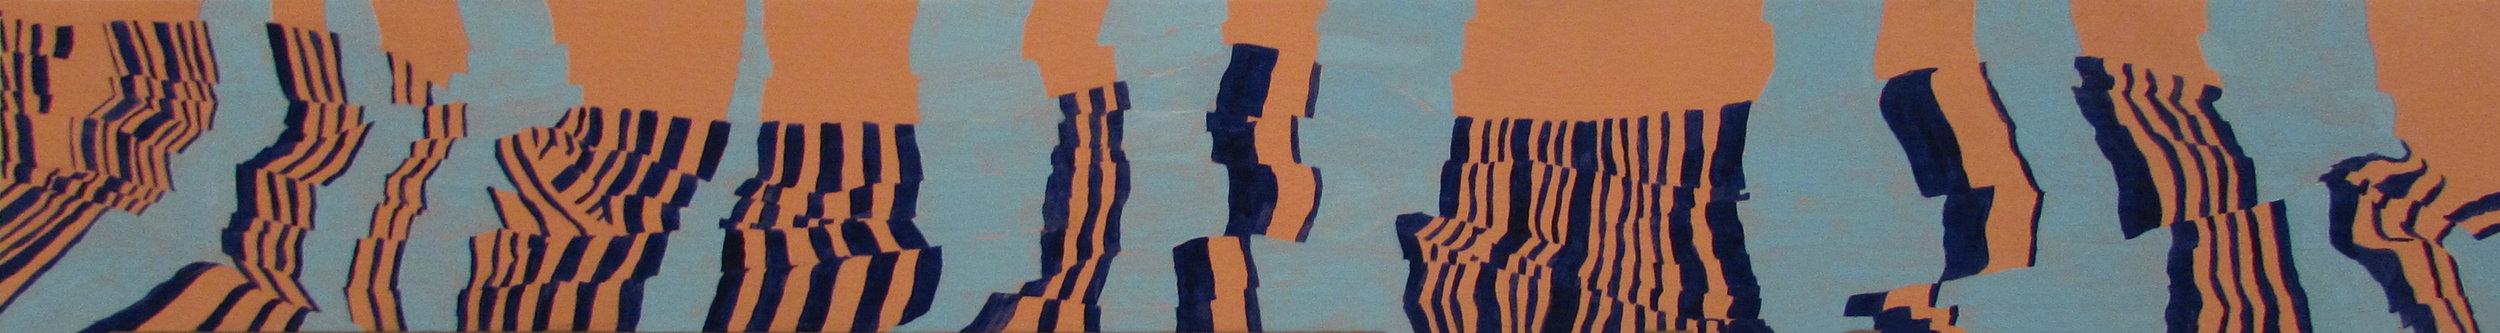 Tremors , oil on panel, 2016.